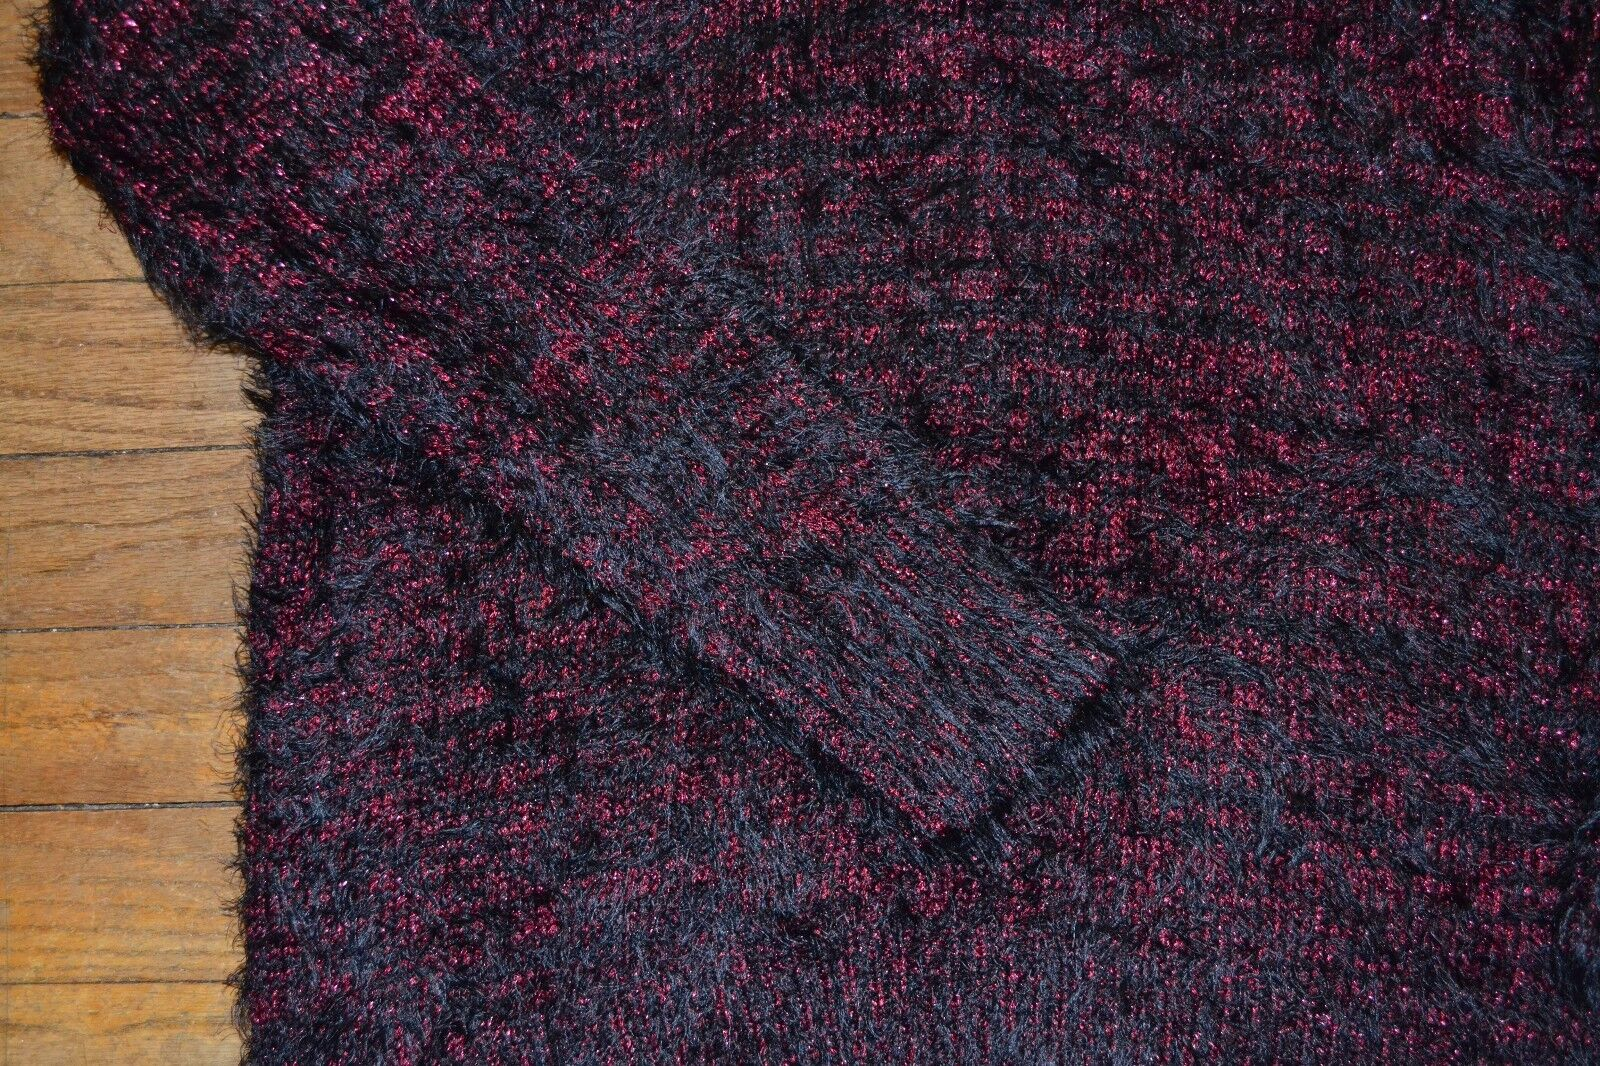 Rock /& Republic V Neck ULTRA SOFT Sweater Wine Reliquary Rose Metallic MSRP $60